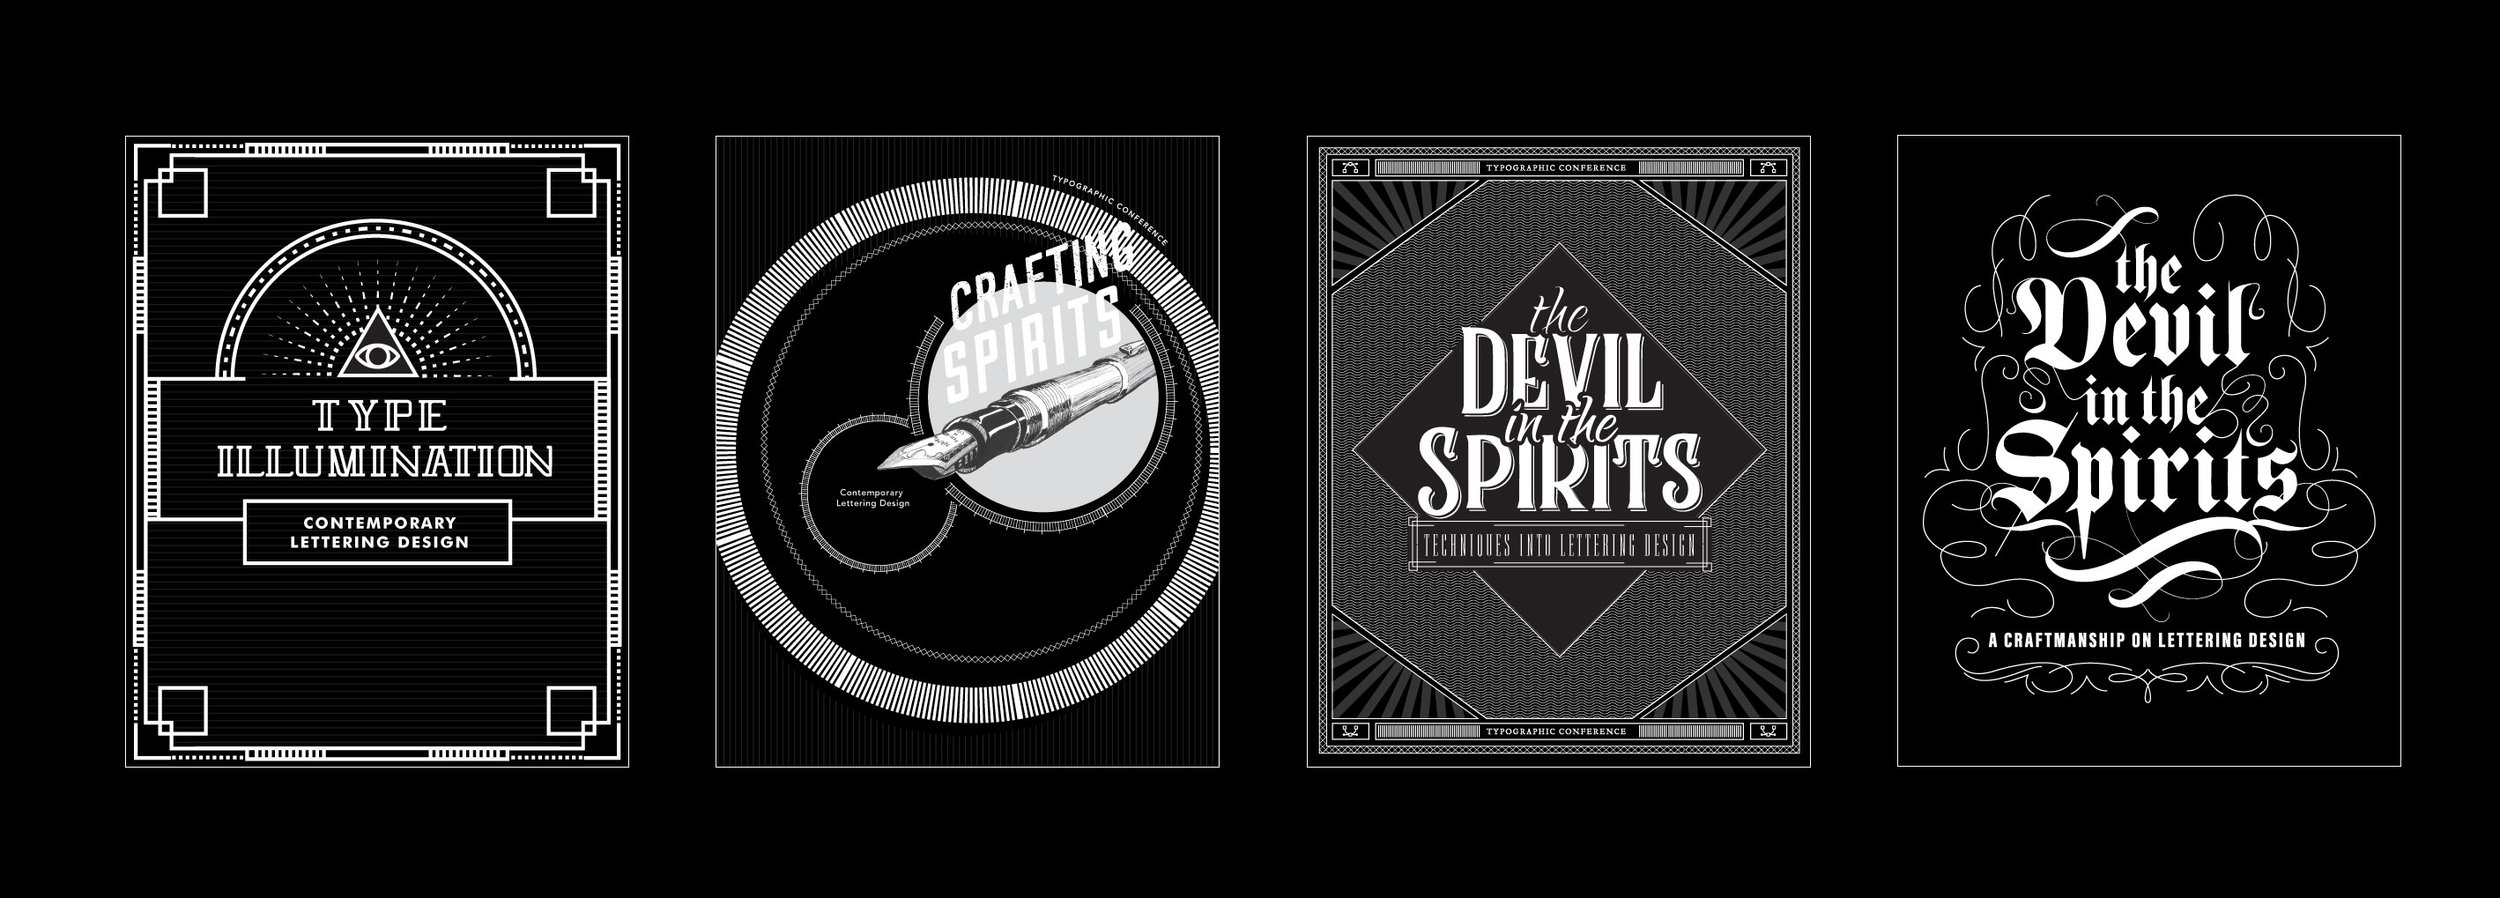 Devil02.jpg